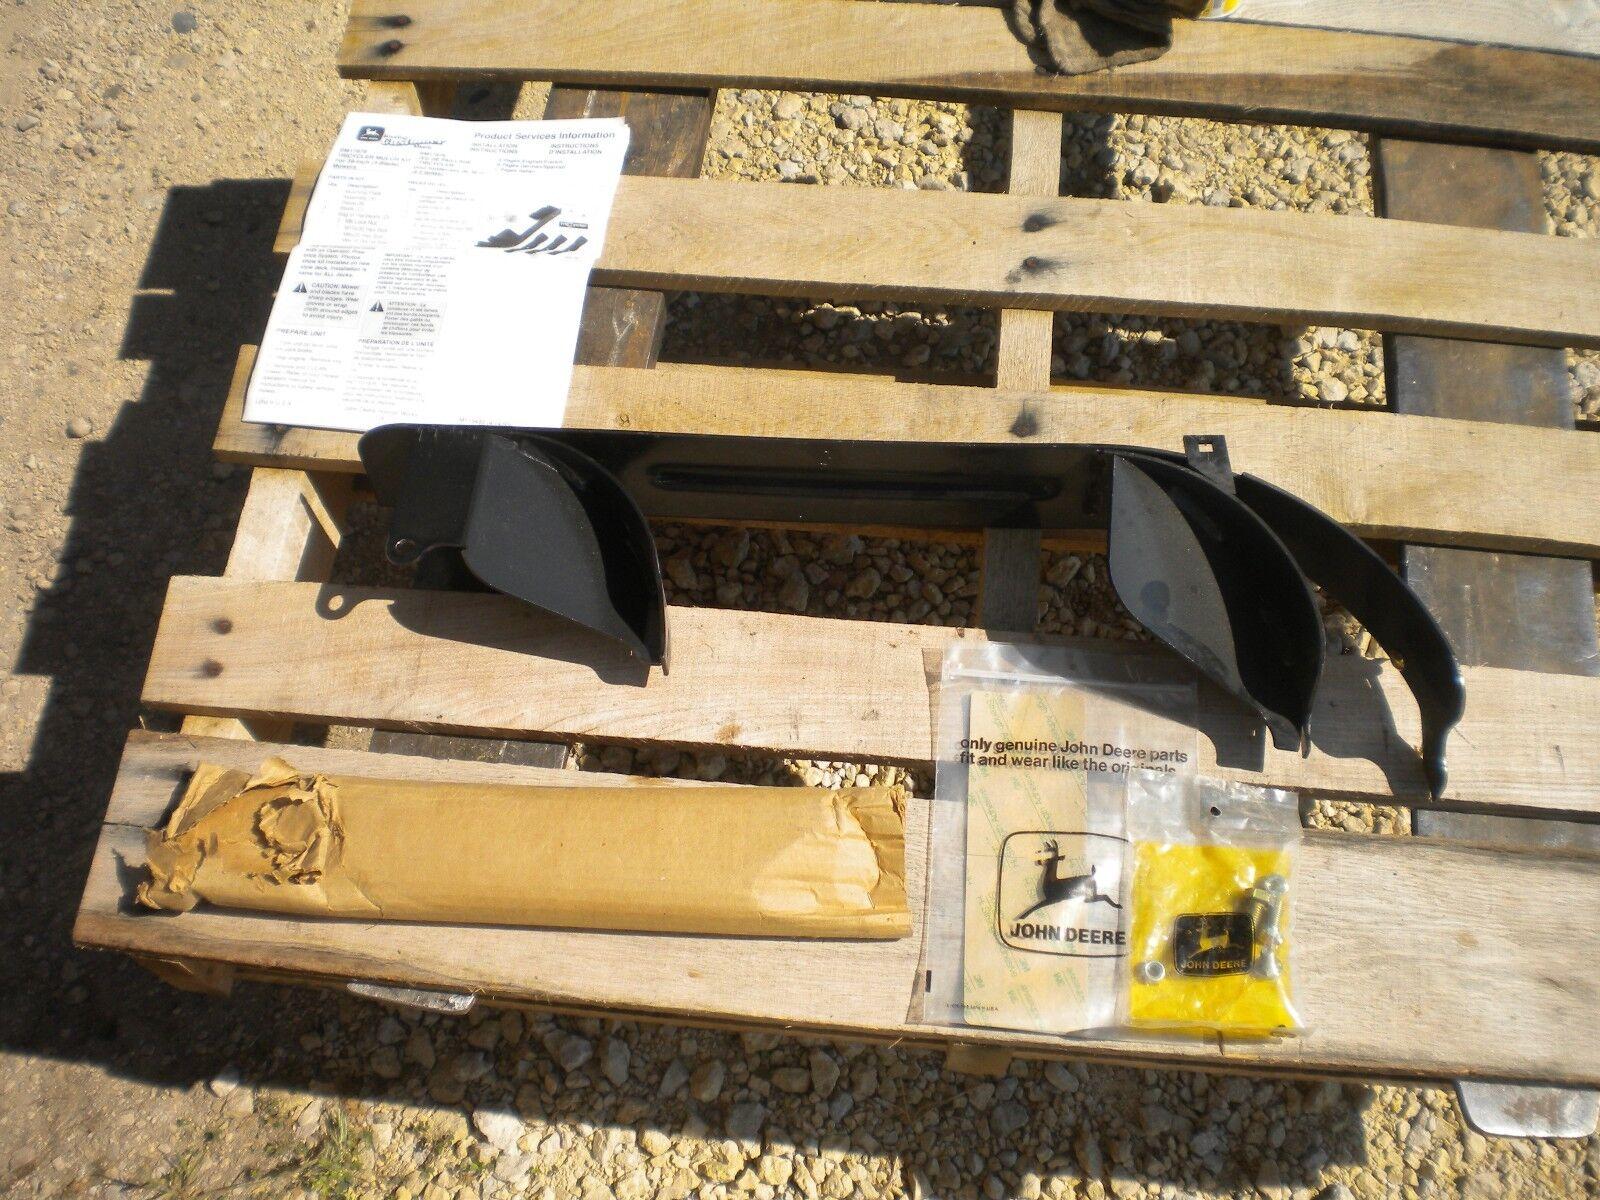 JOHN DEERE BM17876 mantillo Kit 38 in (approx. 96.52 cm) 3 Eje Modelo 39 Cortadoras de 41